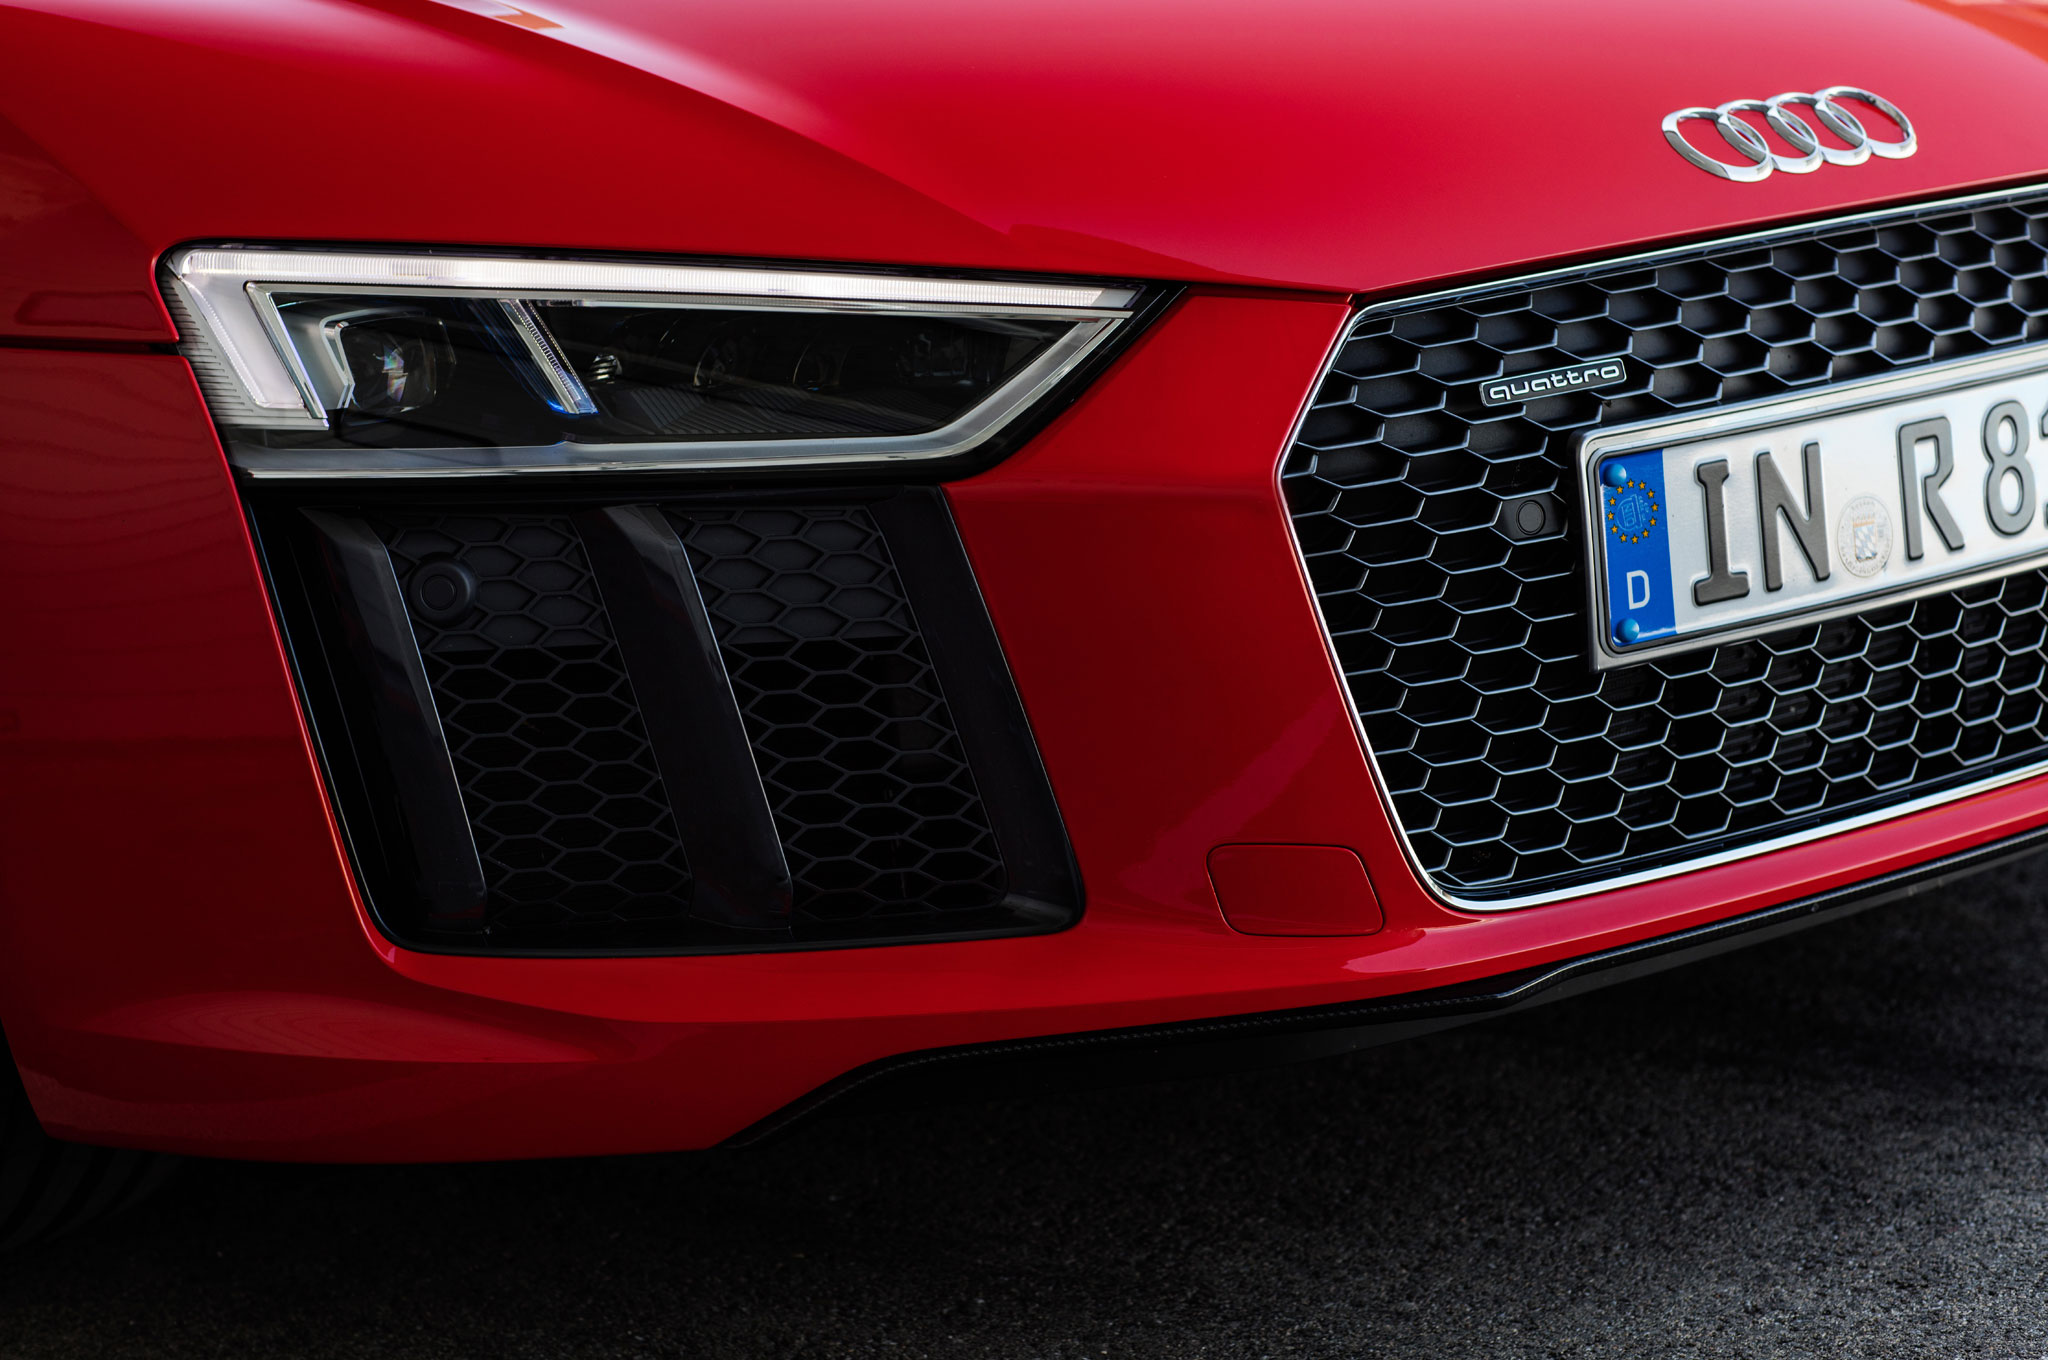 2017 Audi R8 V10 Spyder One Week Review | Automobile Magazine